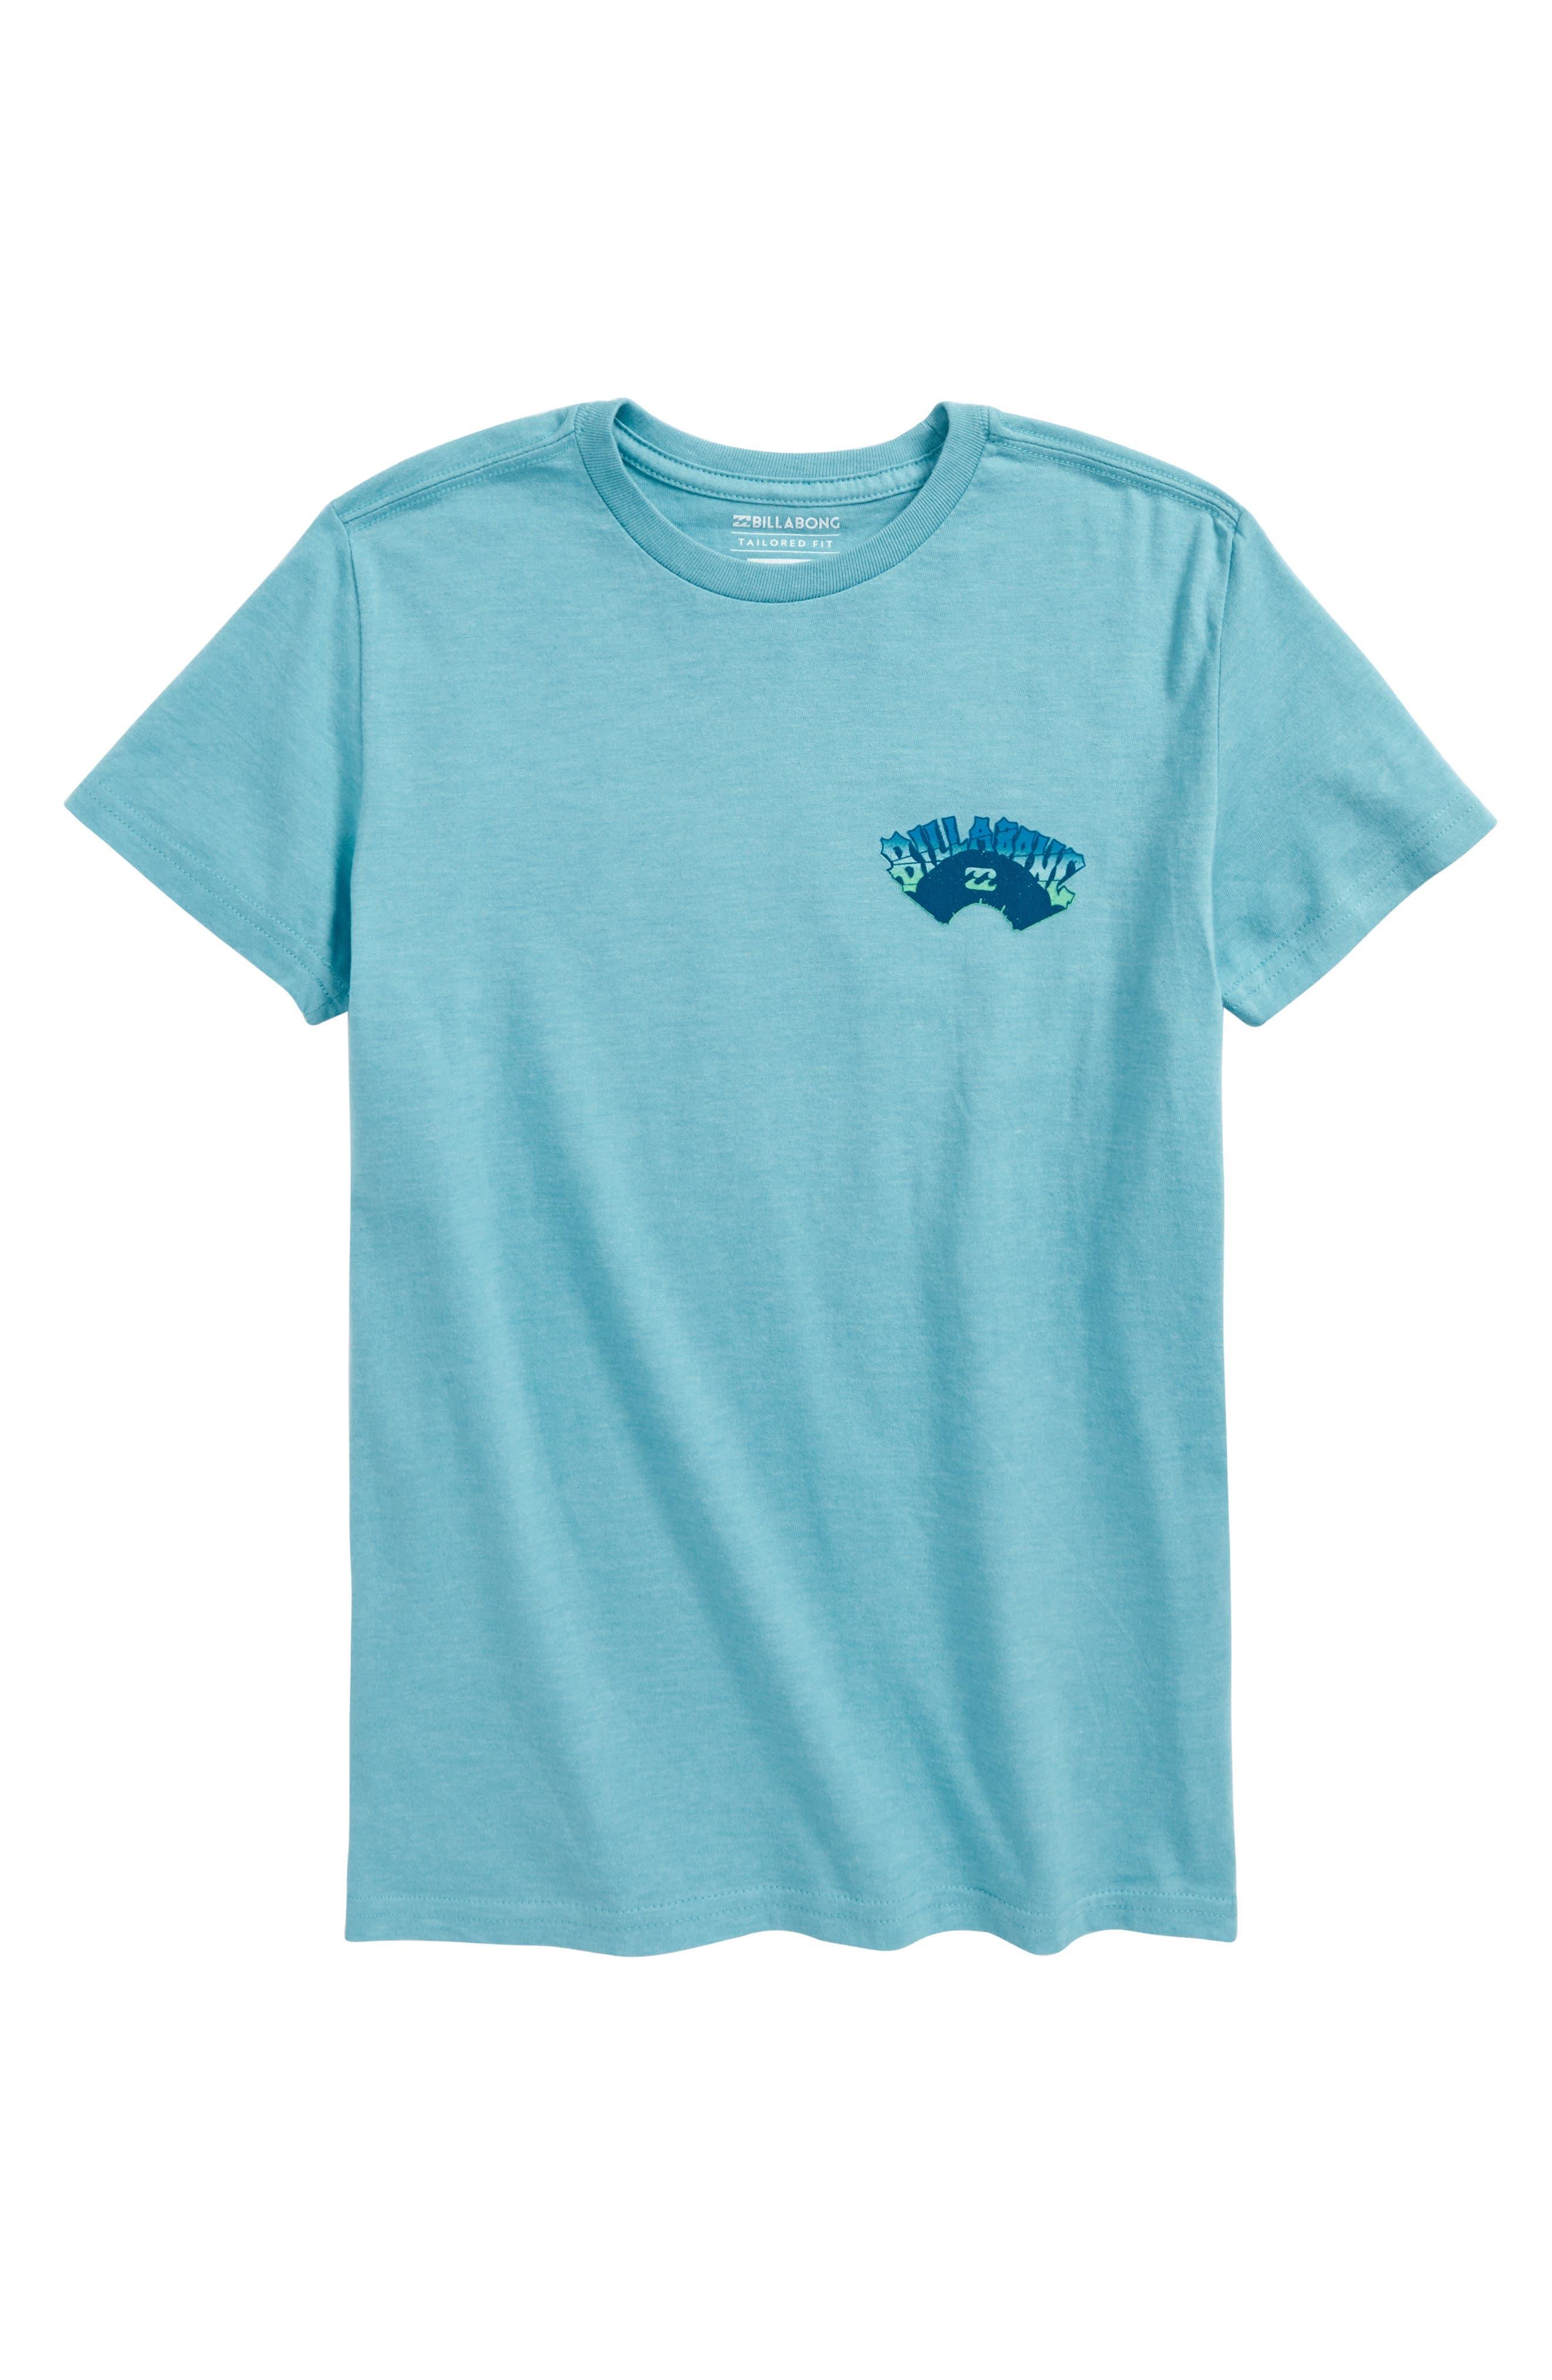 Billabong Dicer Graphic T-Shirt (Big Boys)